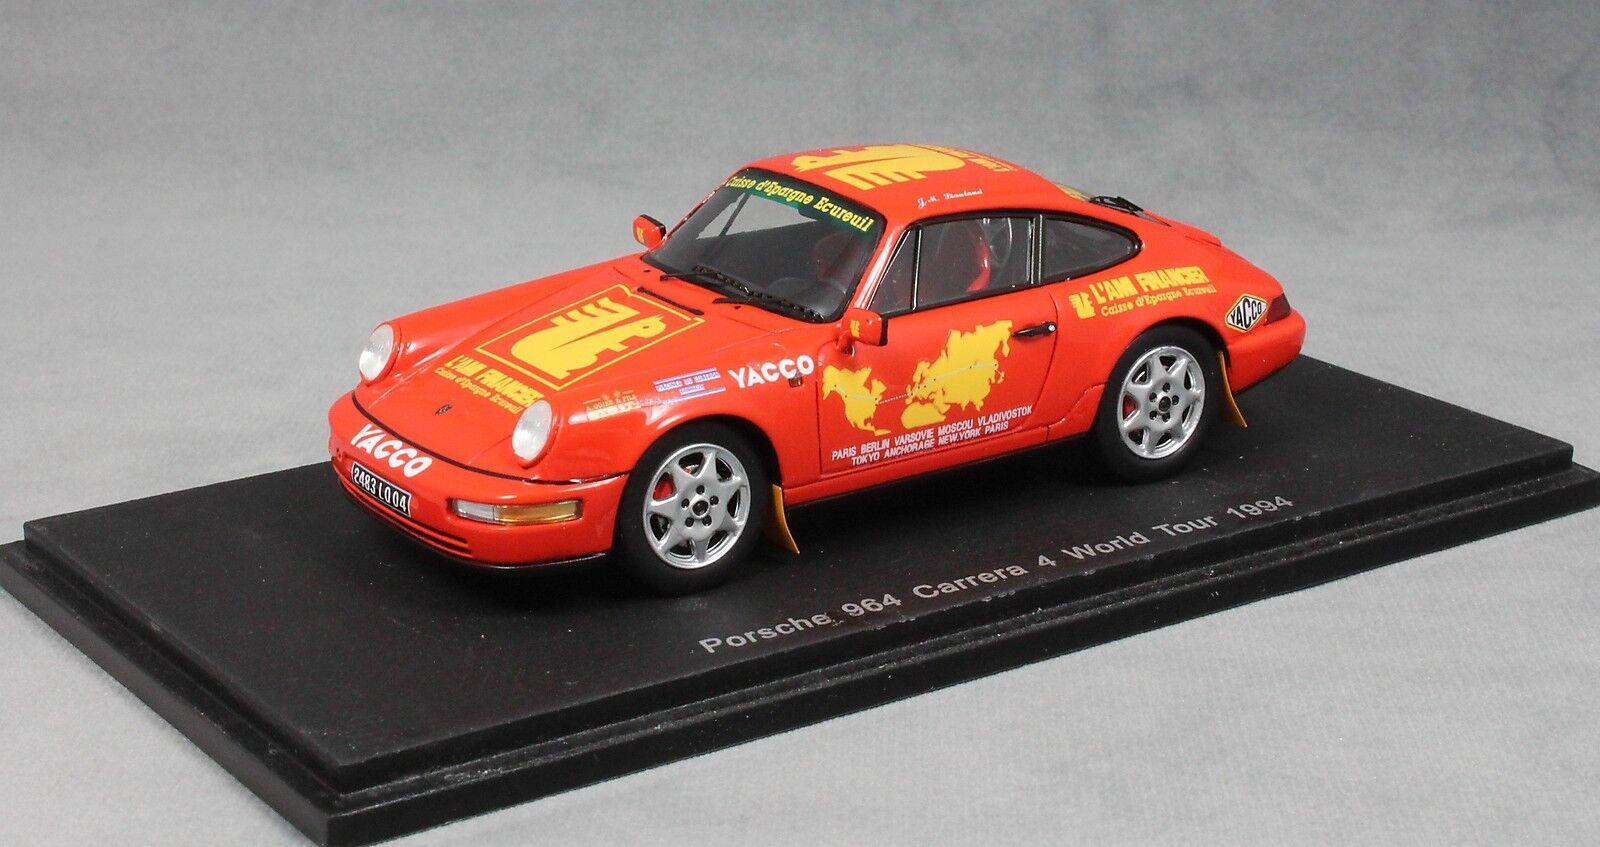 SPARK PORSCHE 911 964 CARRERA 4 World Tour 1994 liautaud S1373